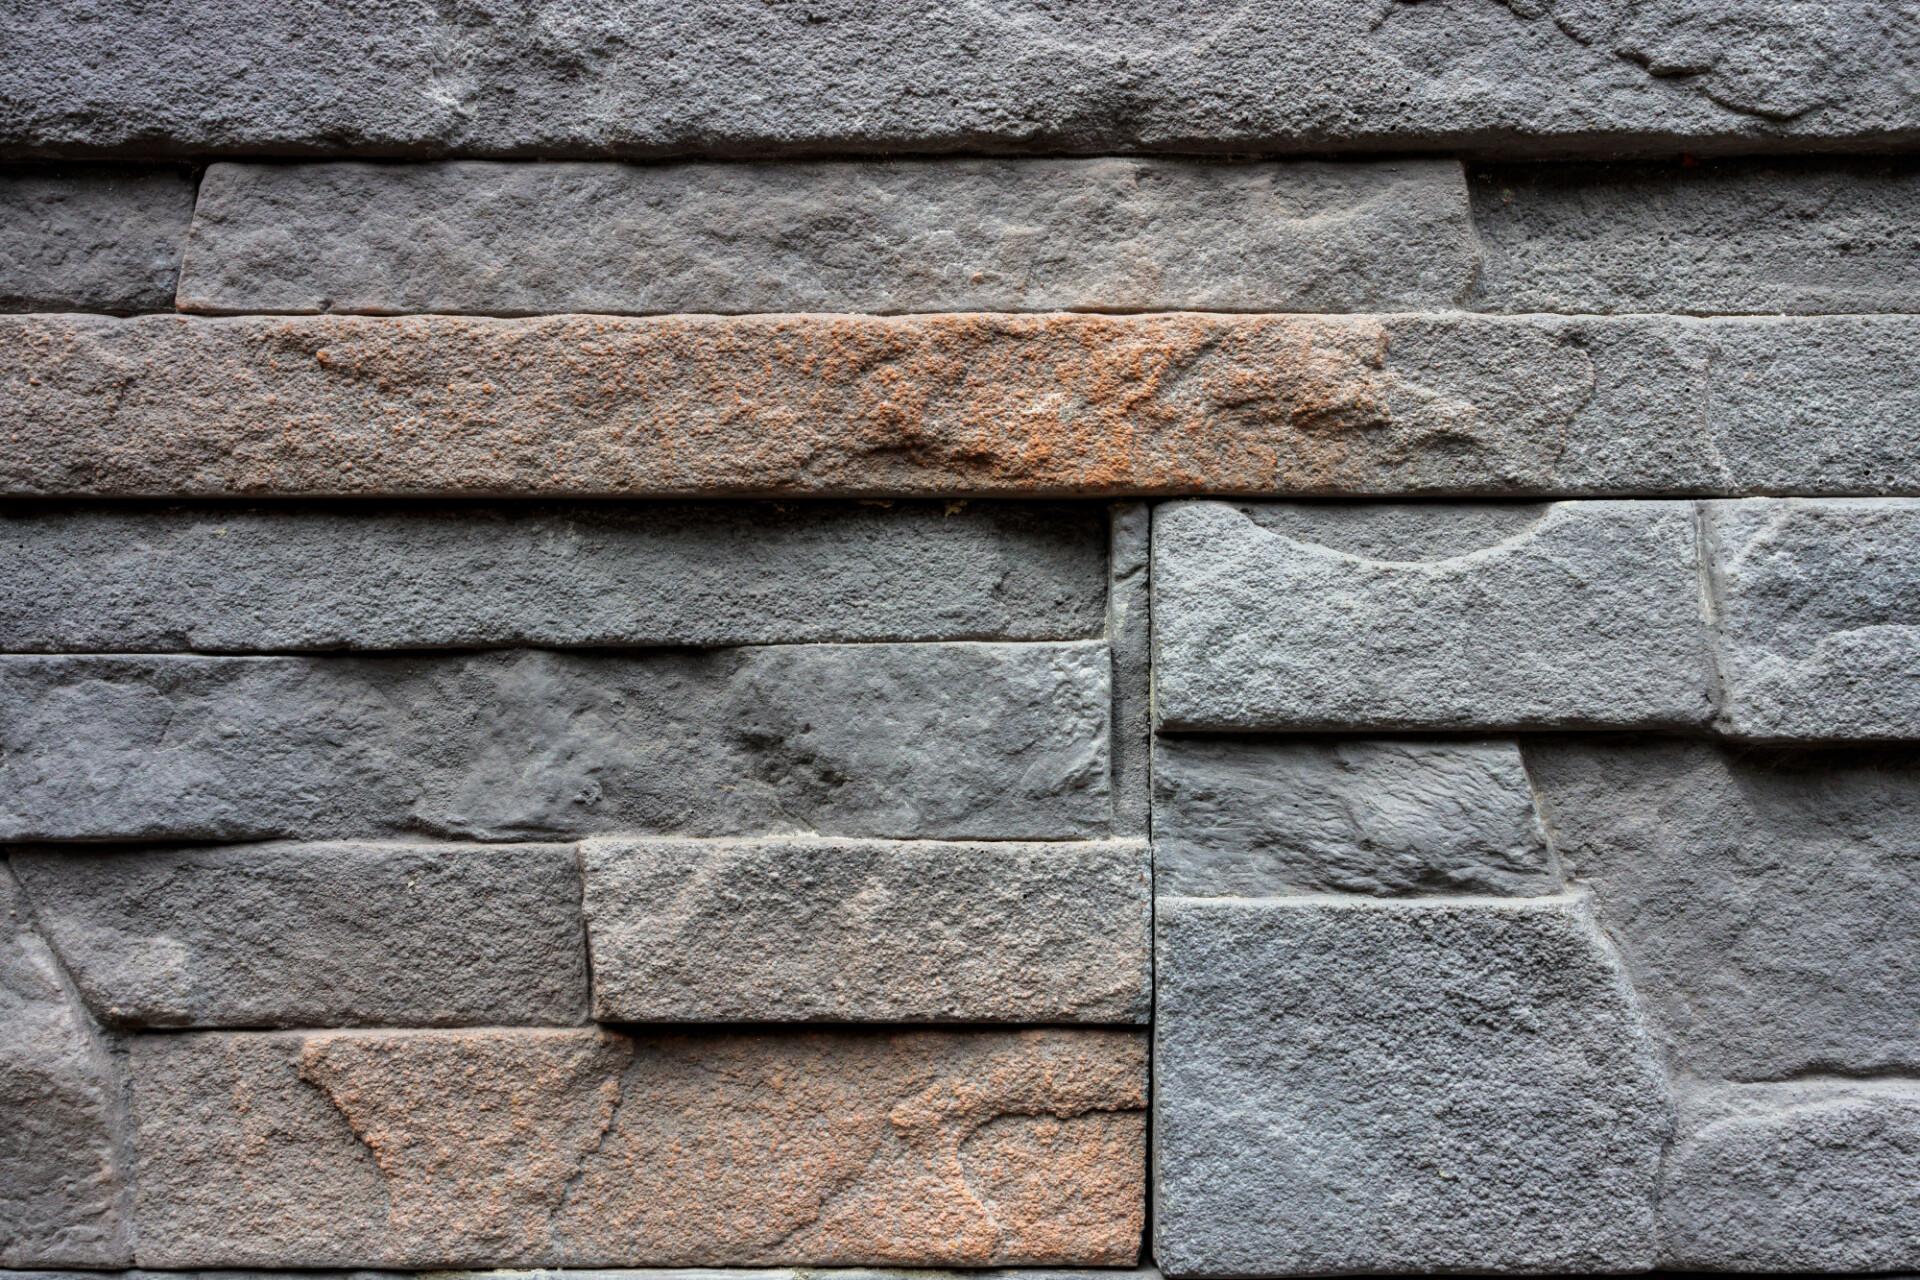 Stone slabs texture